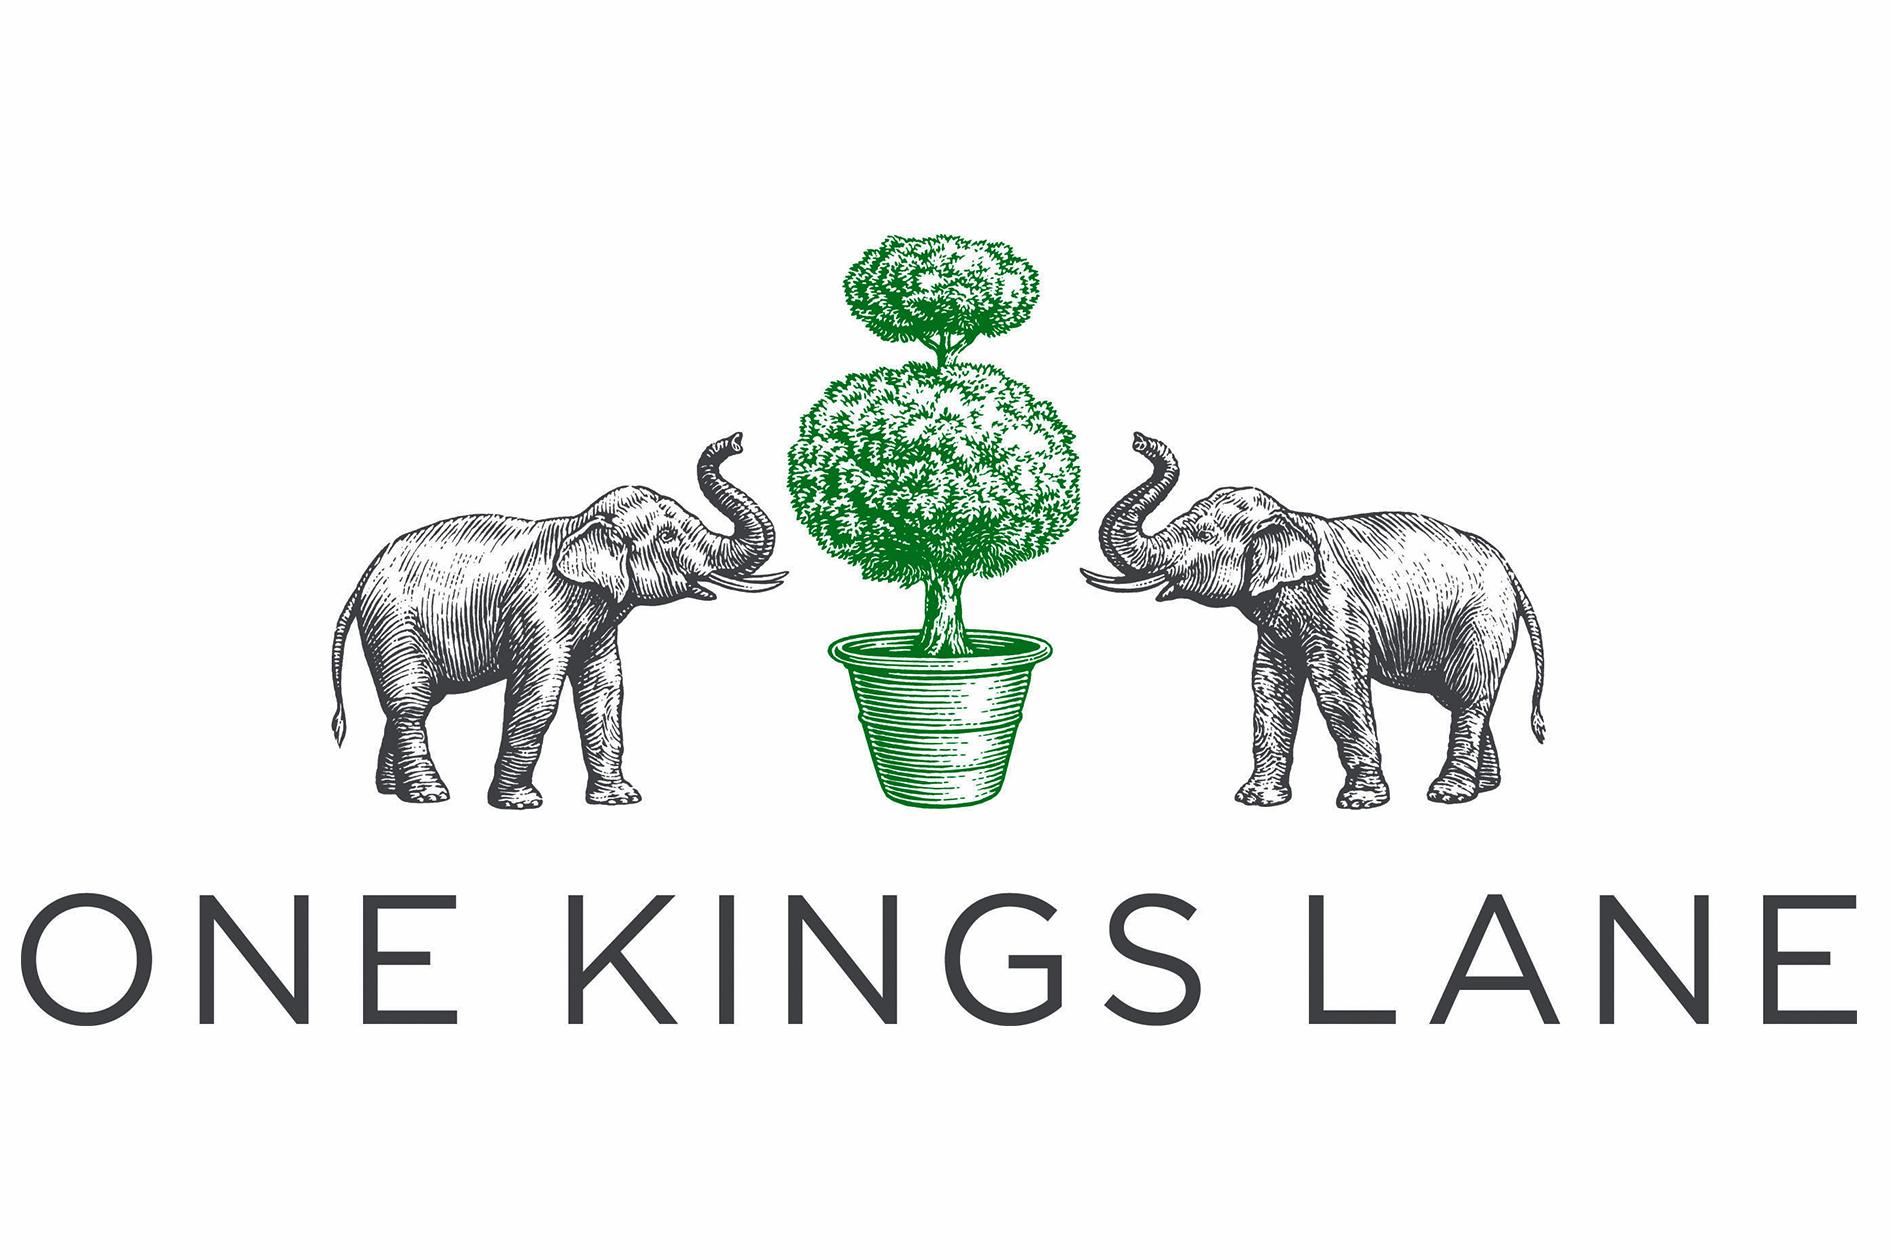 jason-b-graham-collaborations-one-kings-lane-0001